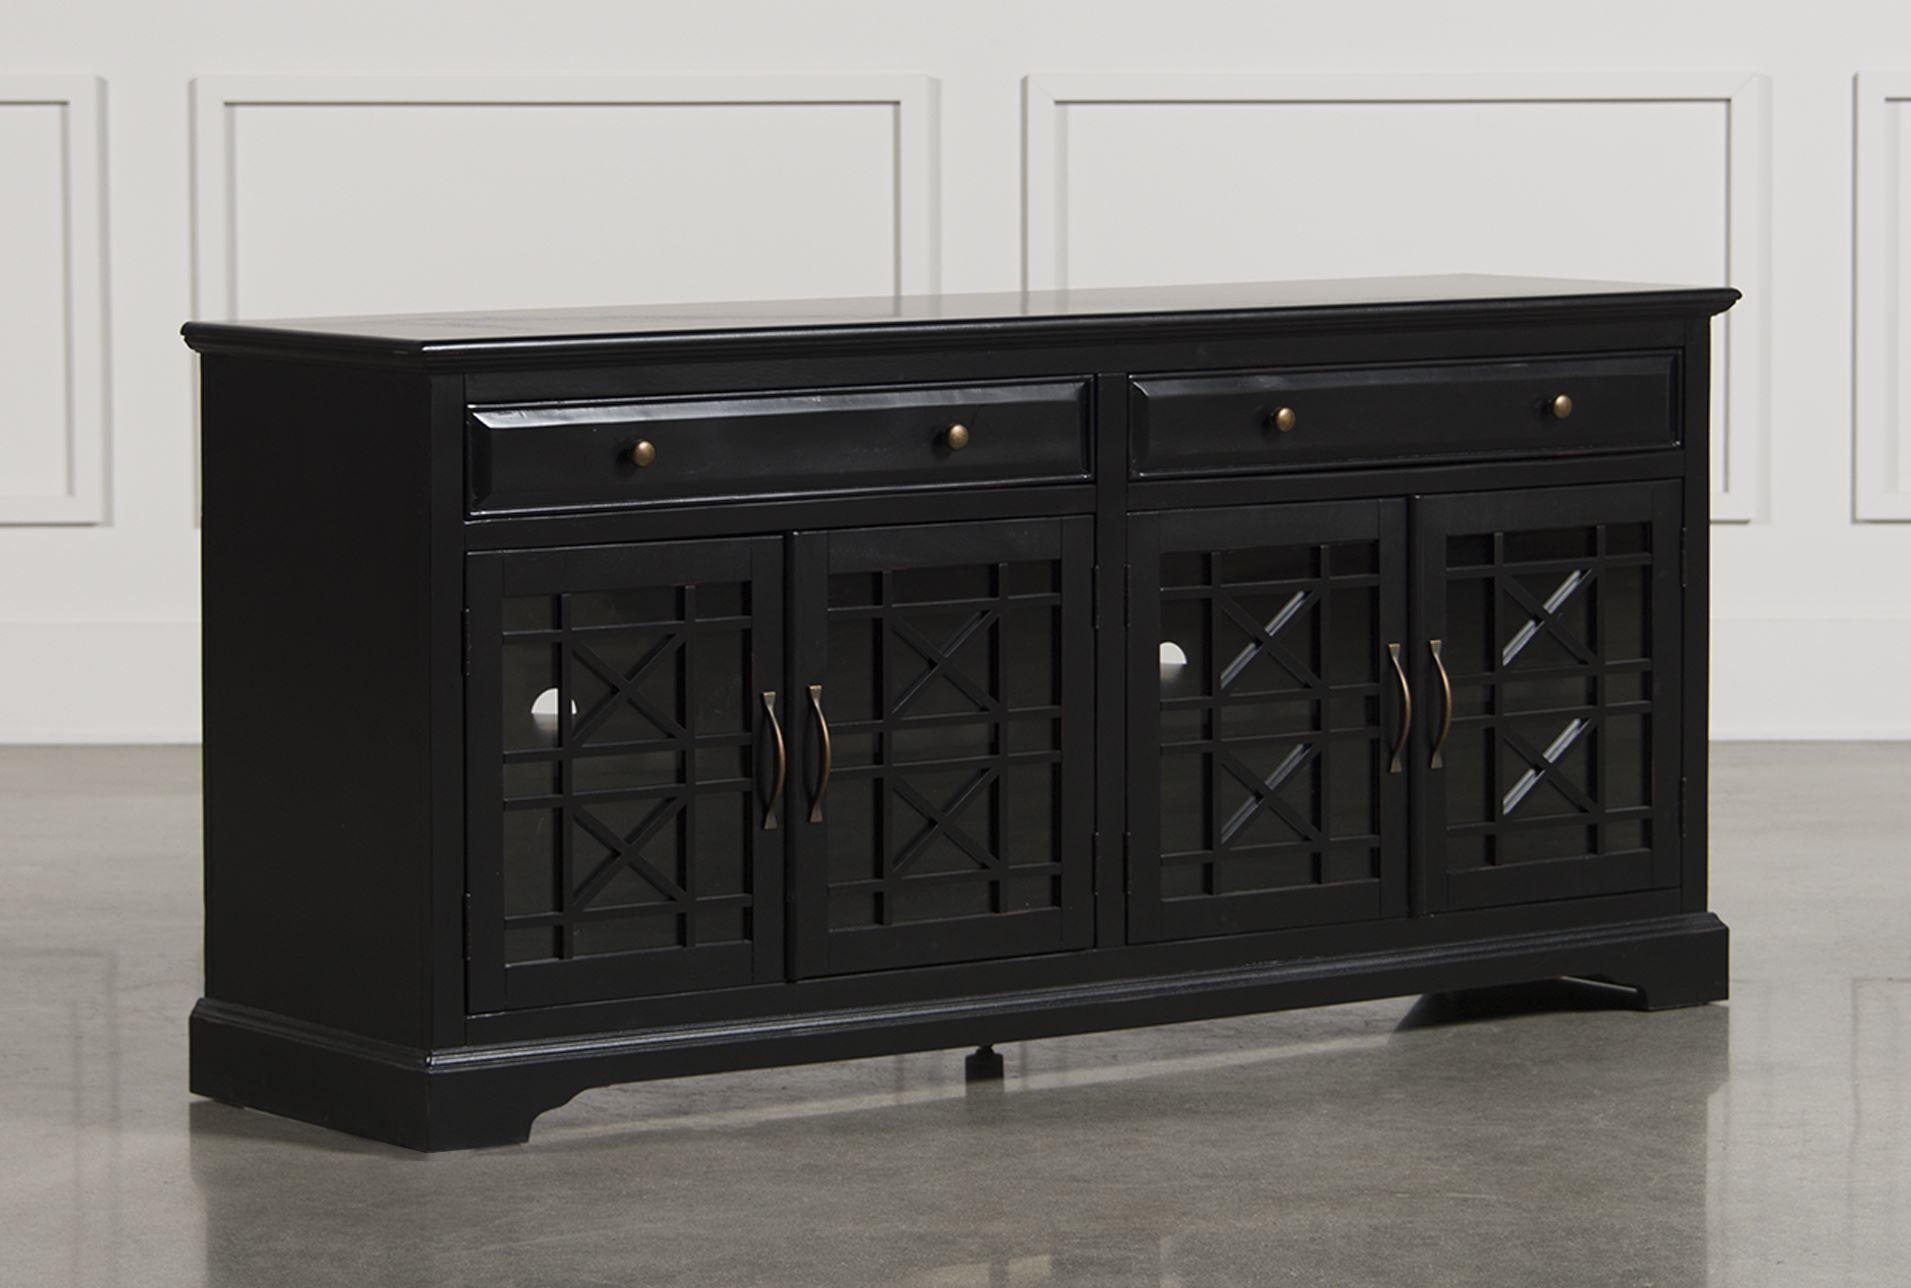 Annabelle Black 70 Inch Media Console Black Glass Tv Stand 70 Inch Tv Stand Tv Stand 70 inch media console